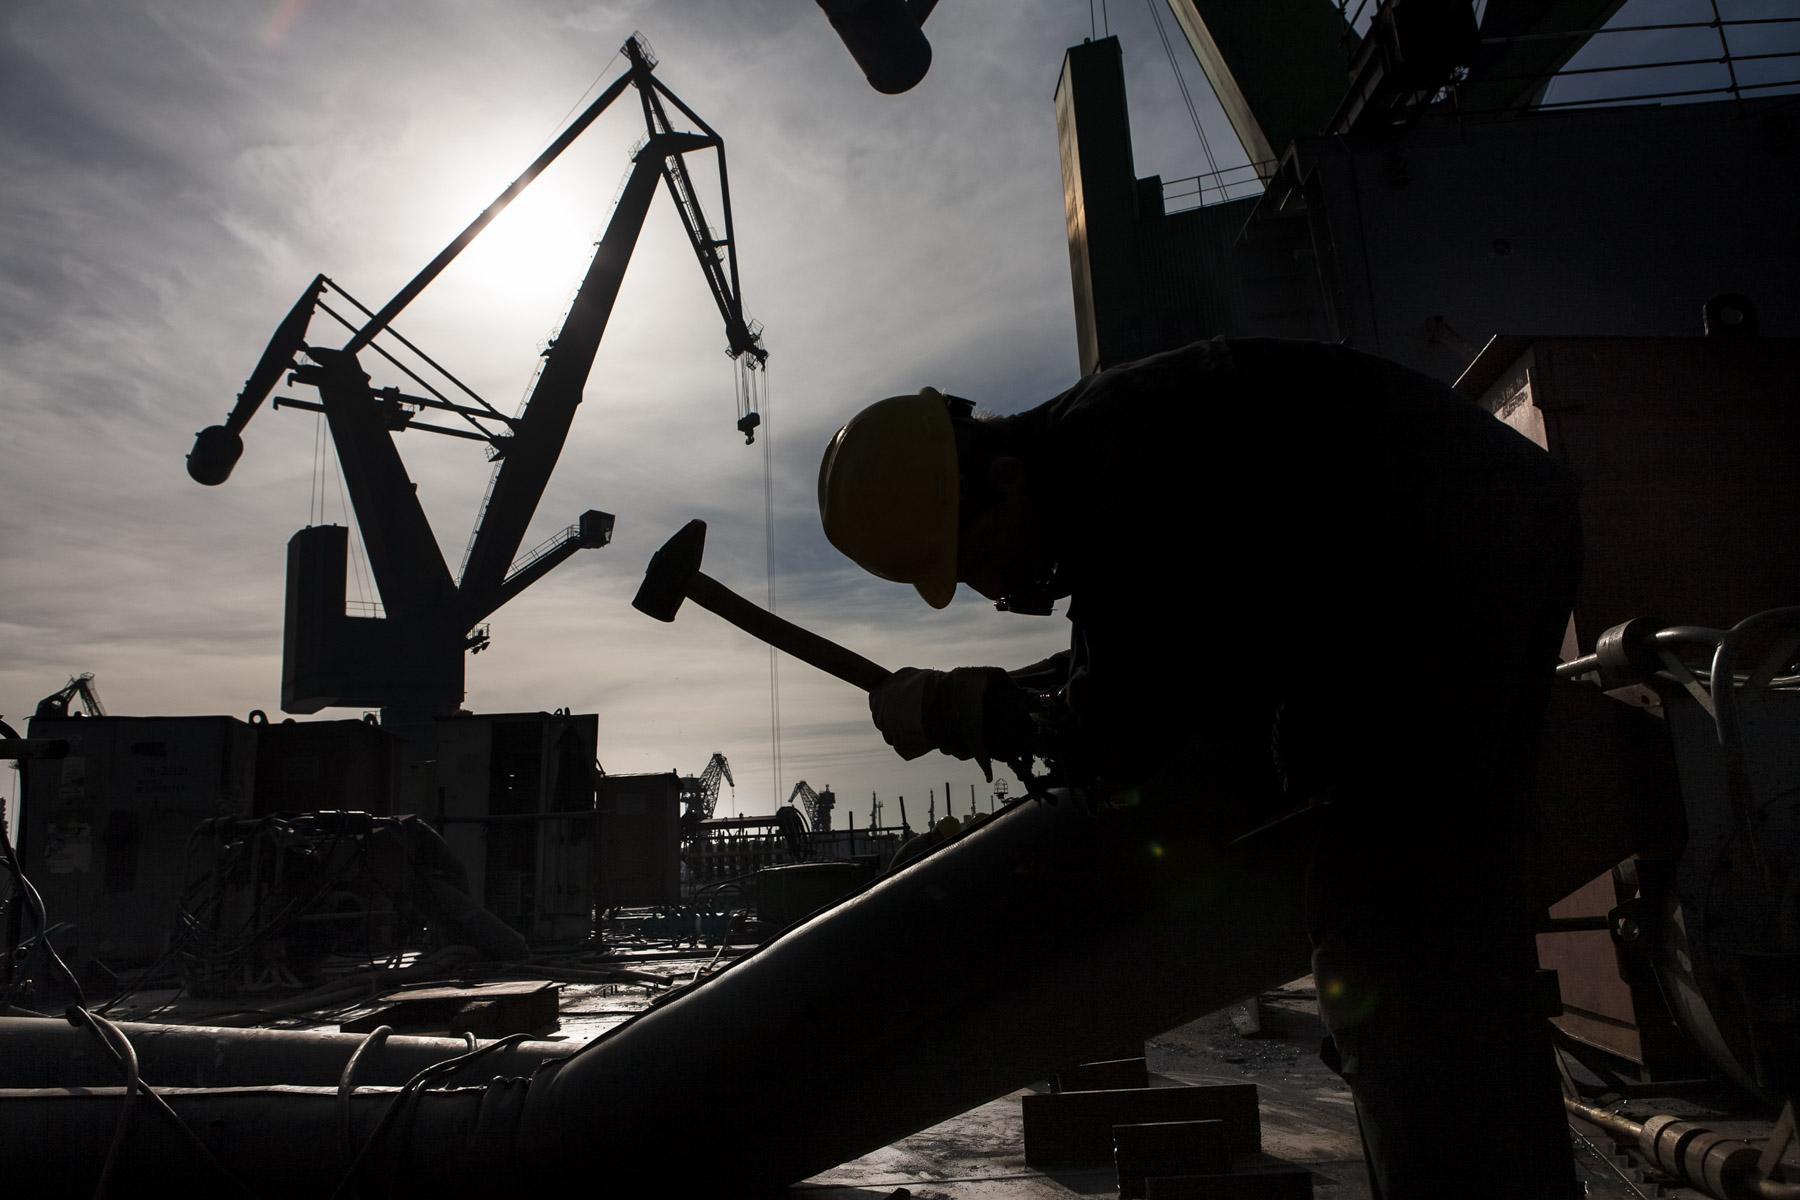 01-Gdansk-Shipyard_01_MG_1199_p-Mikolaj-Nowacki